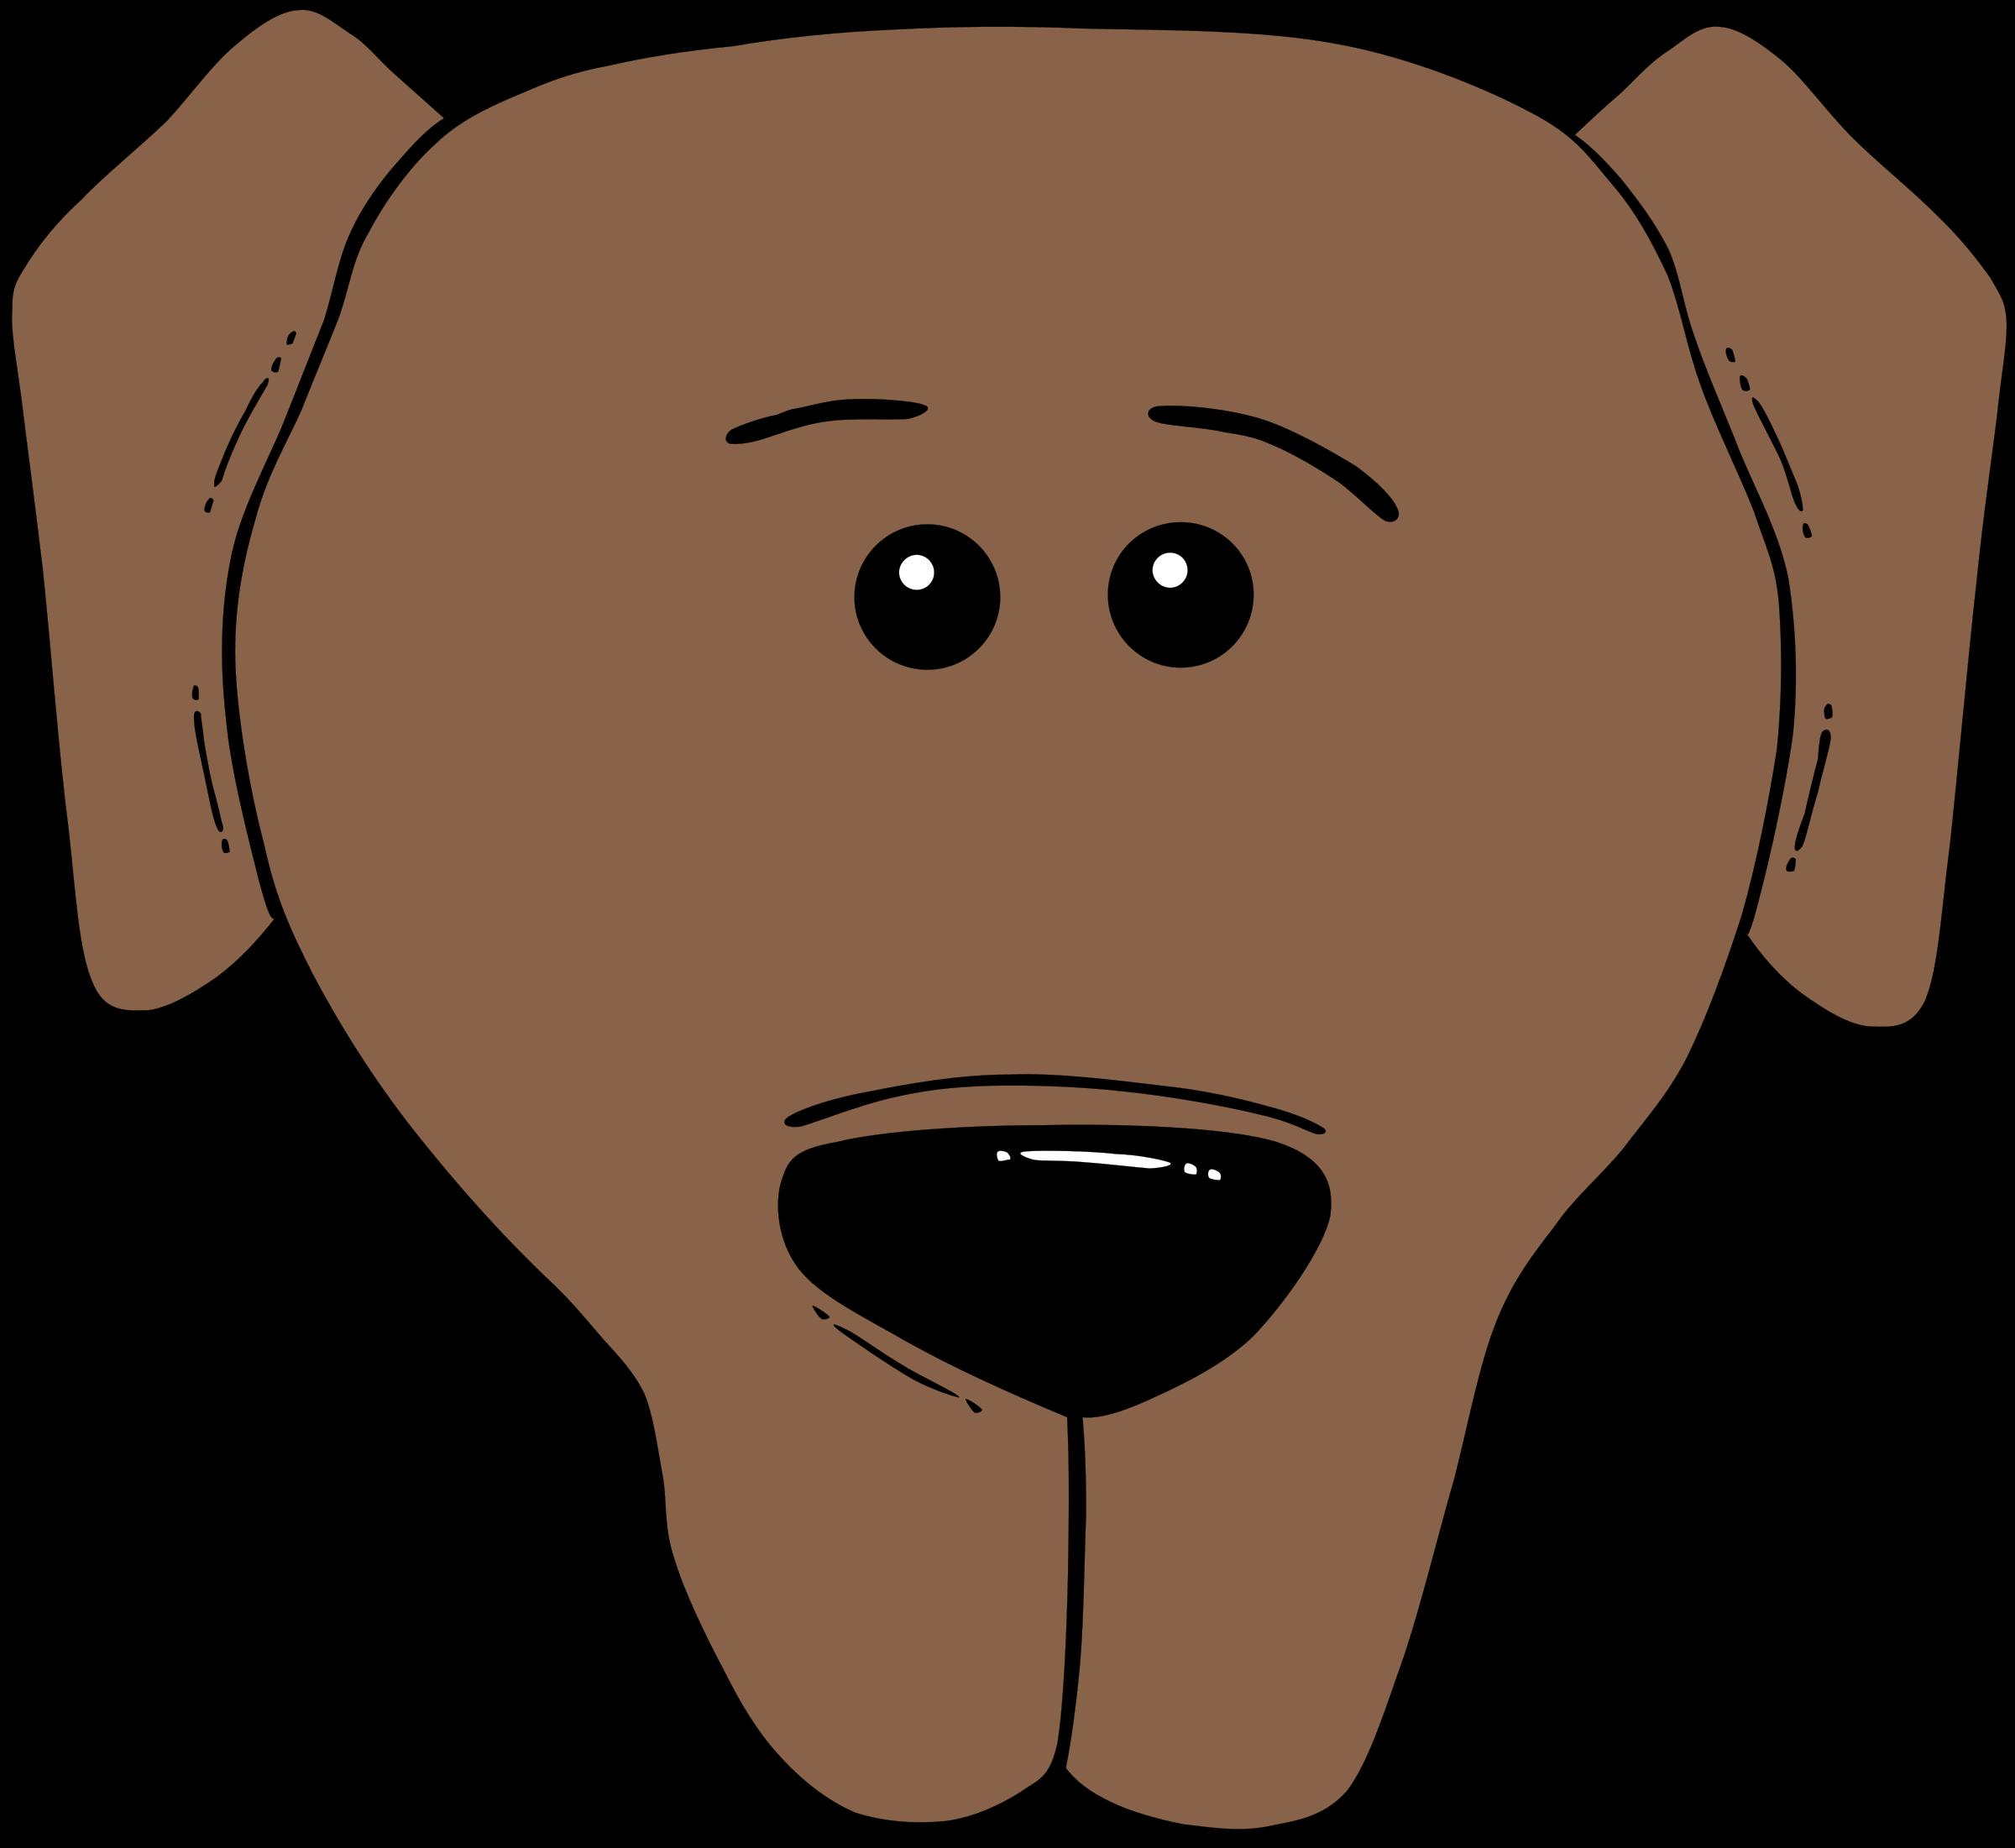 Clipart world face. Dog cartoon label big